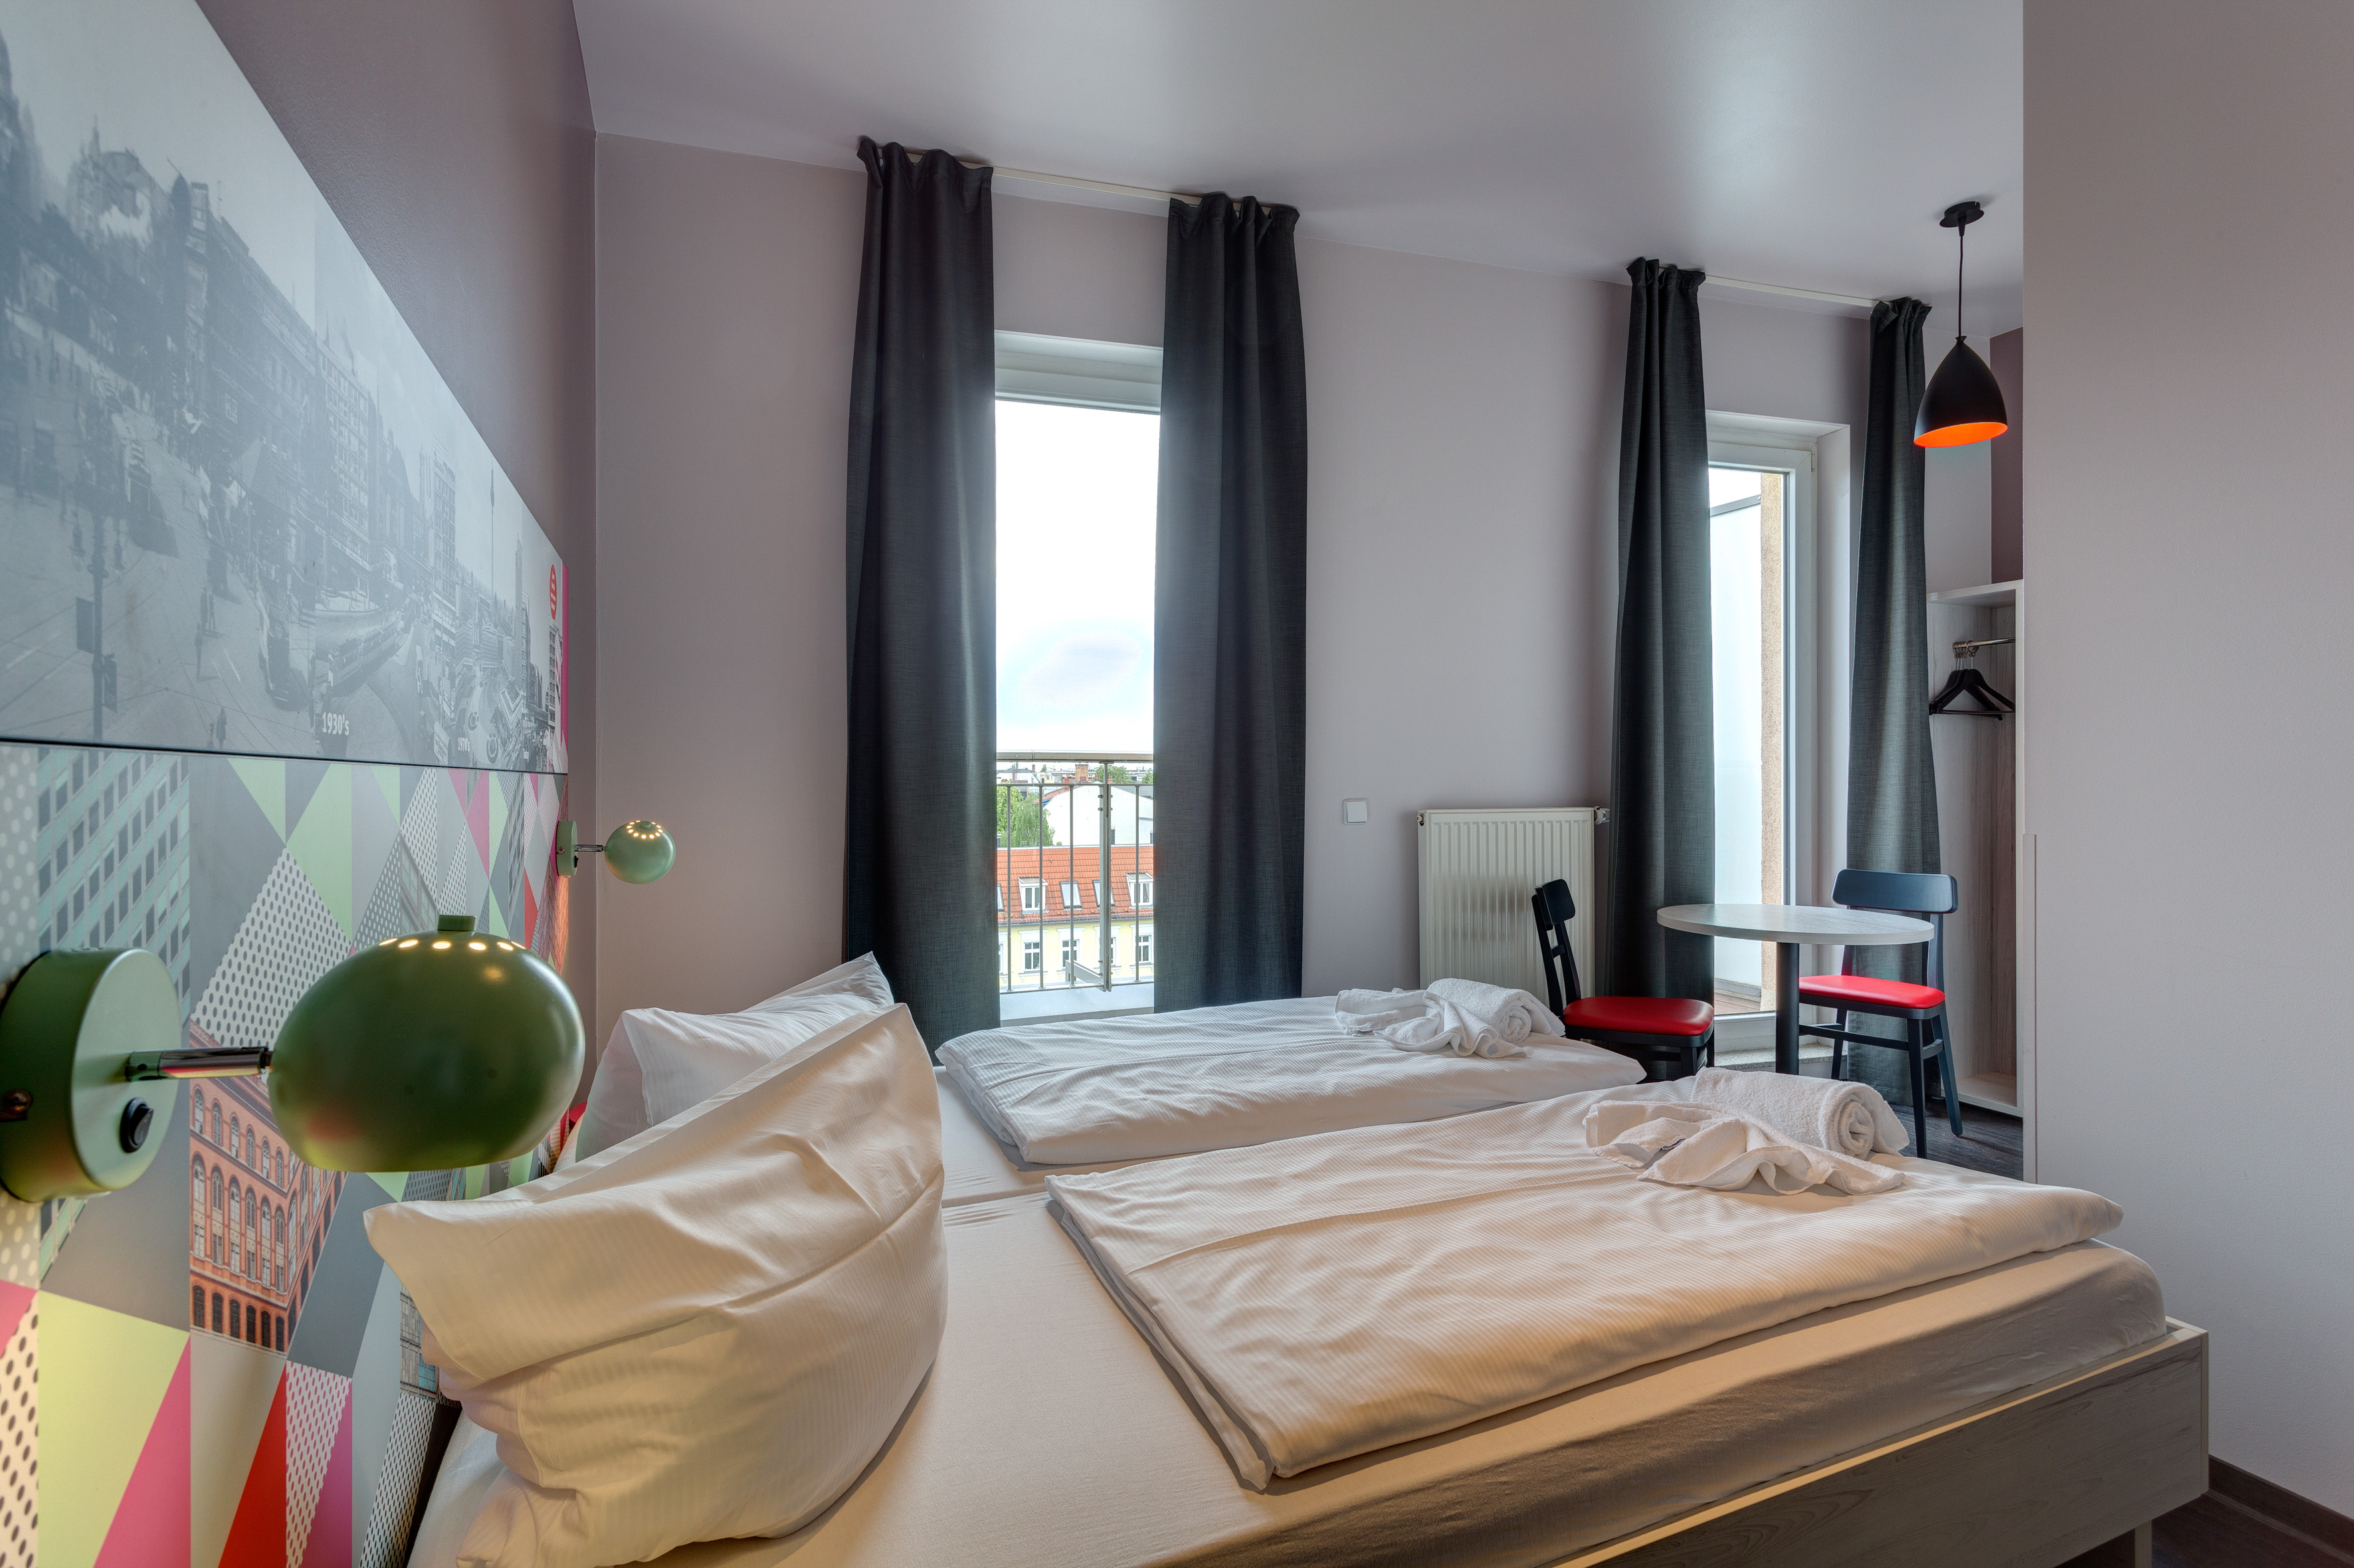 MEININGER Hotel Berlin Alexanderplatz - Habitación individual/doble